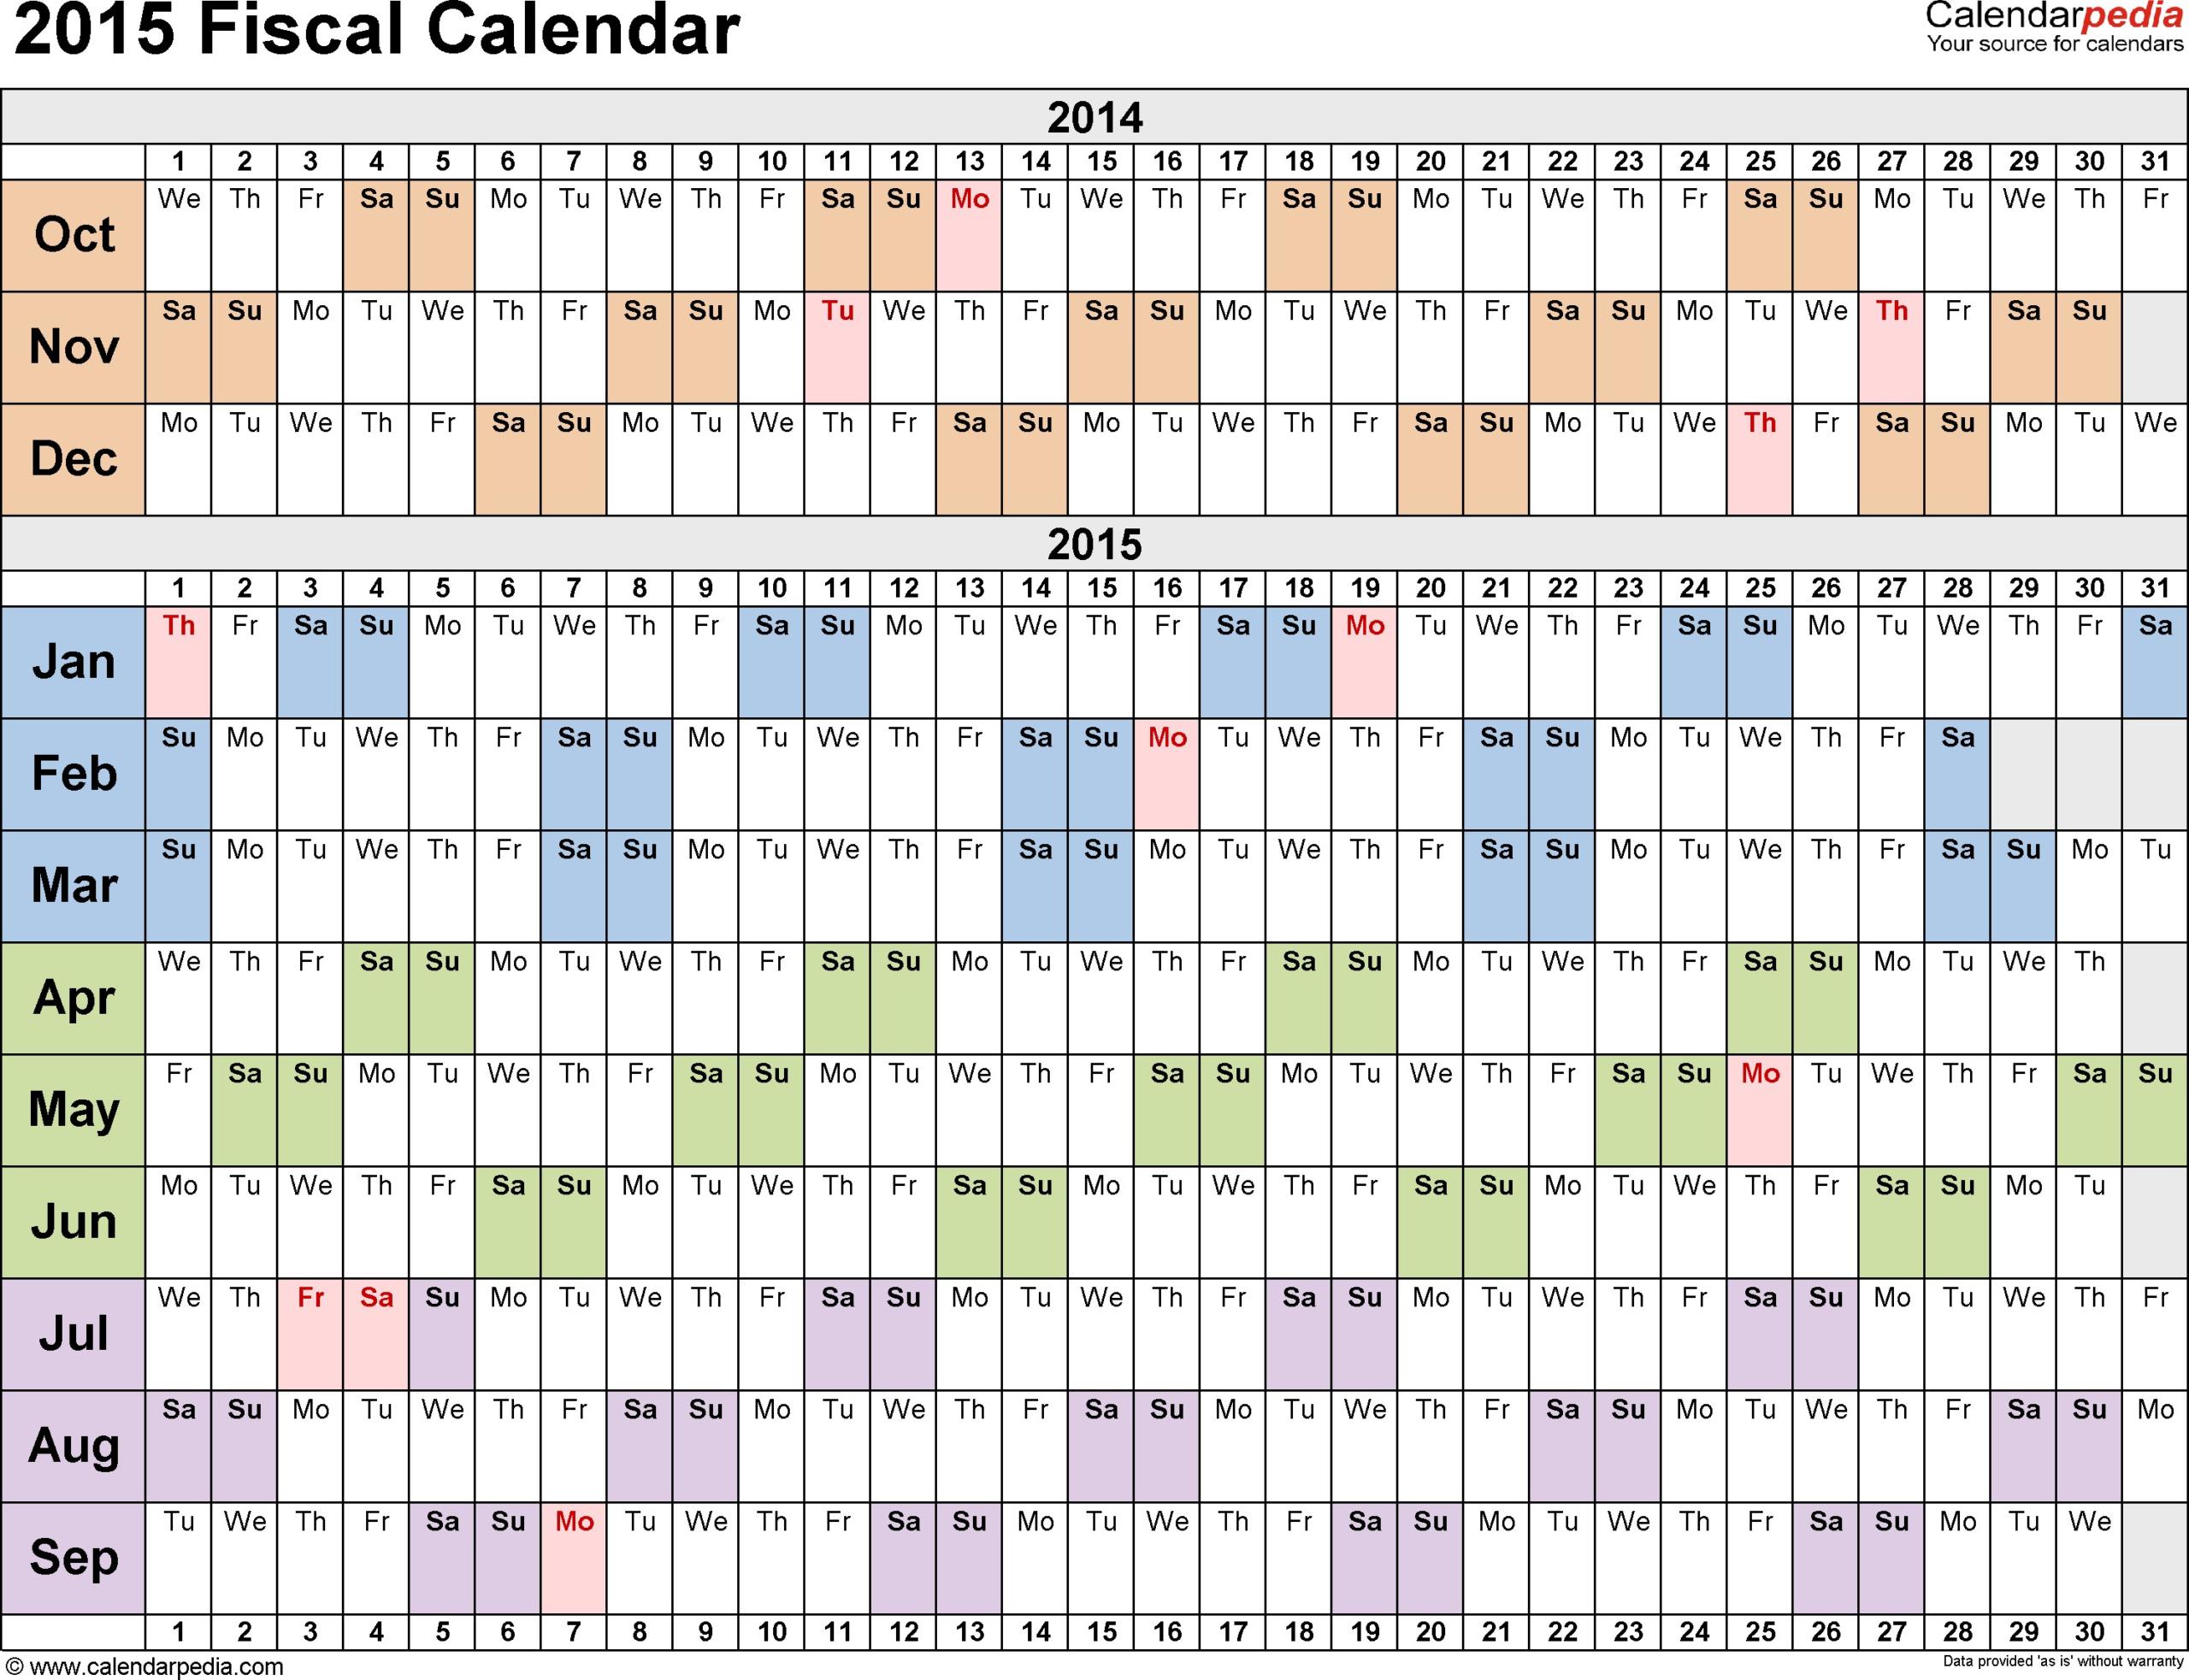 4 4 5 Calendar 2015 - Calendar